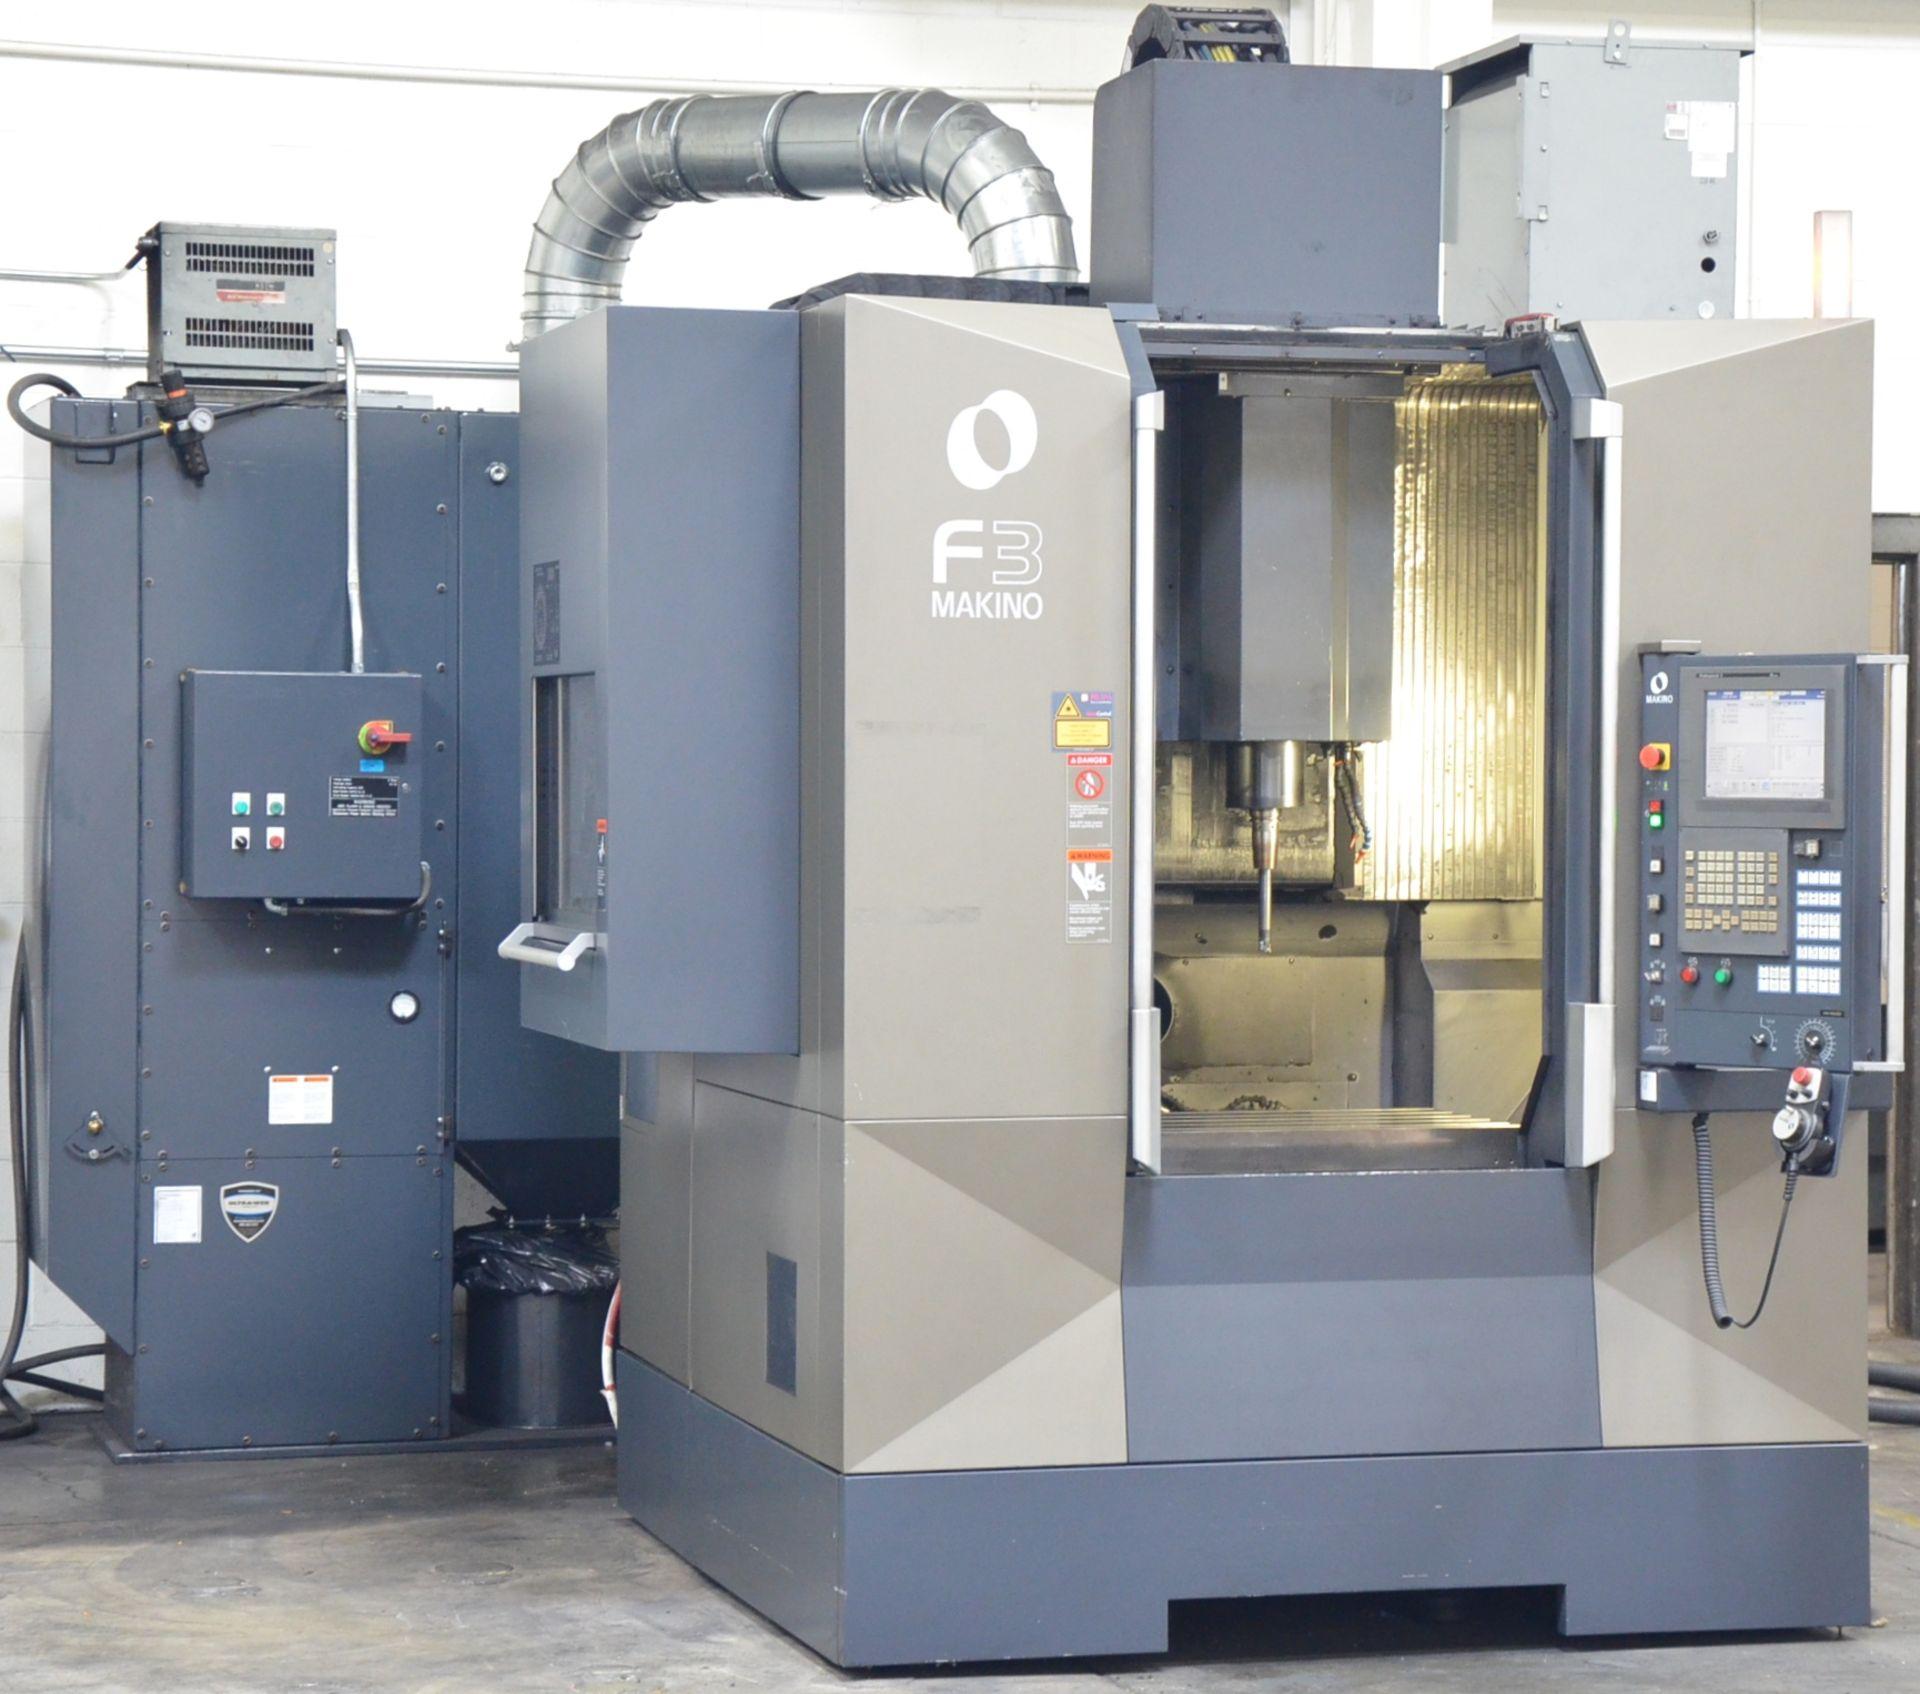 MAKINO (2012) F3 CNC VERTICAL MACHINING CENTER WITH MAKINO PROFESSIONAL 5 TOUCHSCREEN CNC CONTROL,